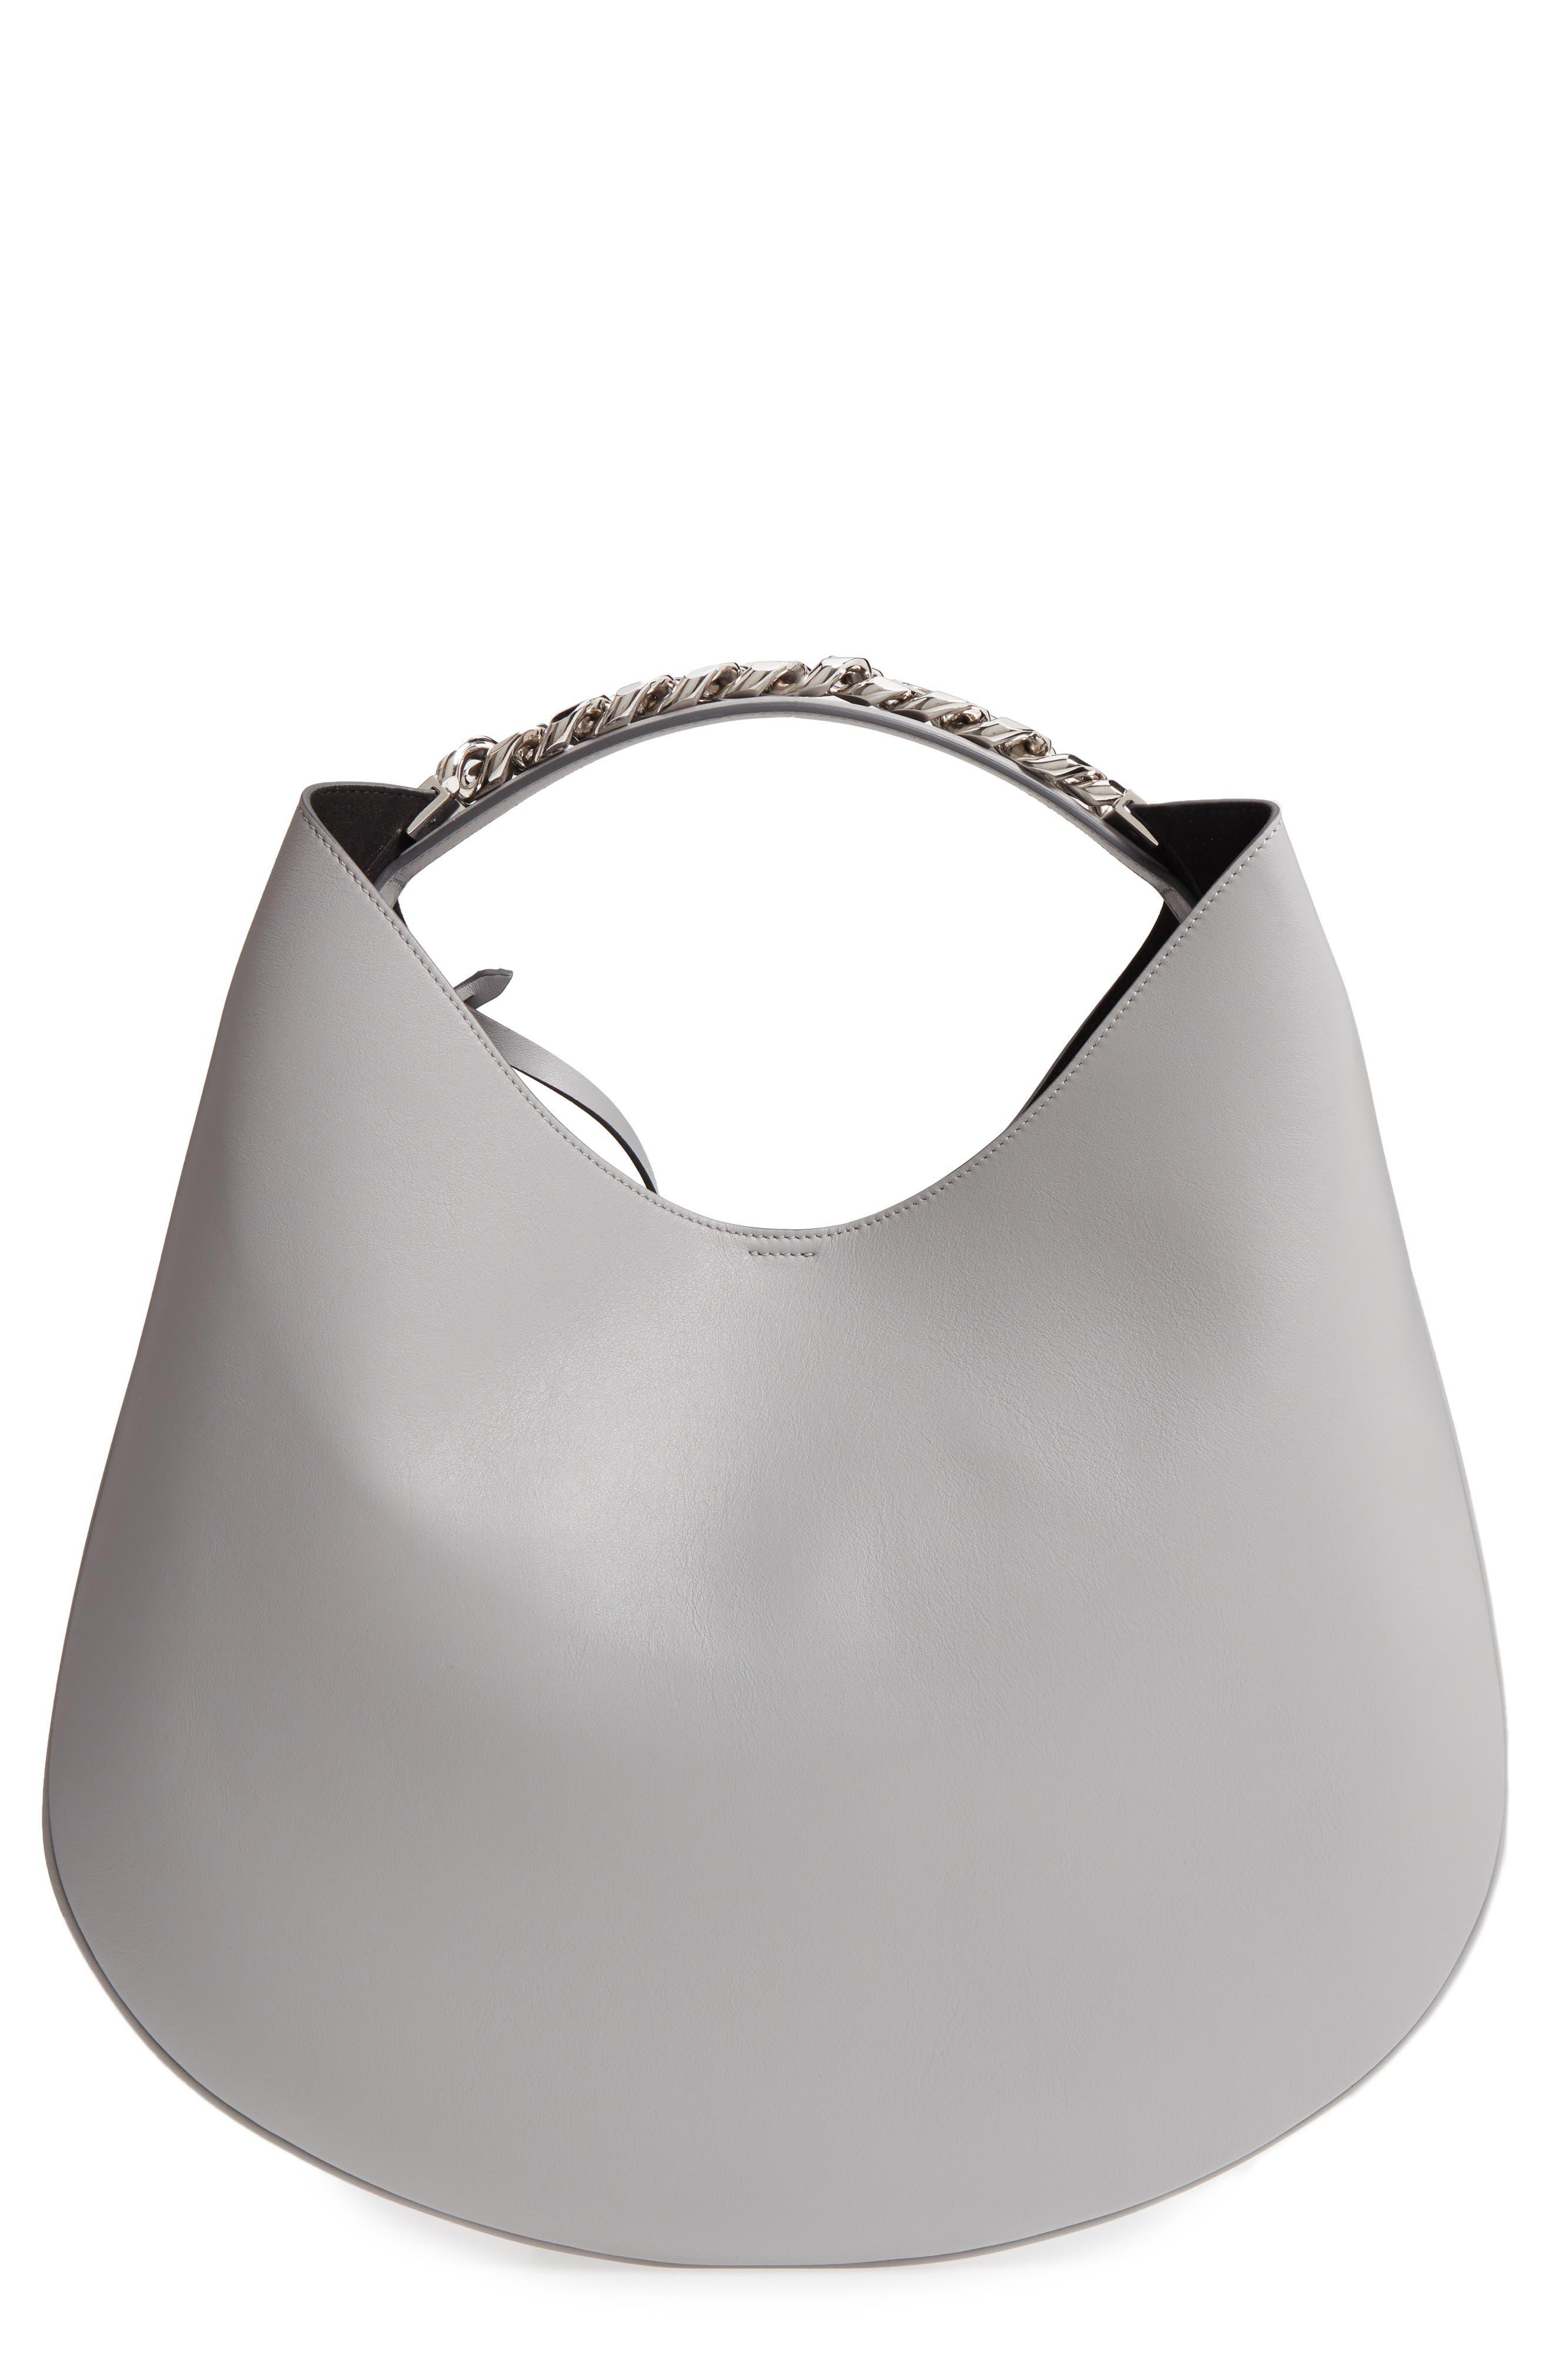 Medium Infinity Calfskin Leather Hobo,                         Main,                         color, Pearl Grey